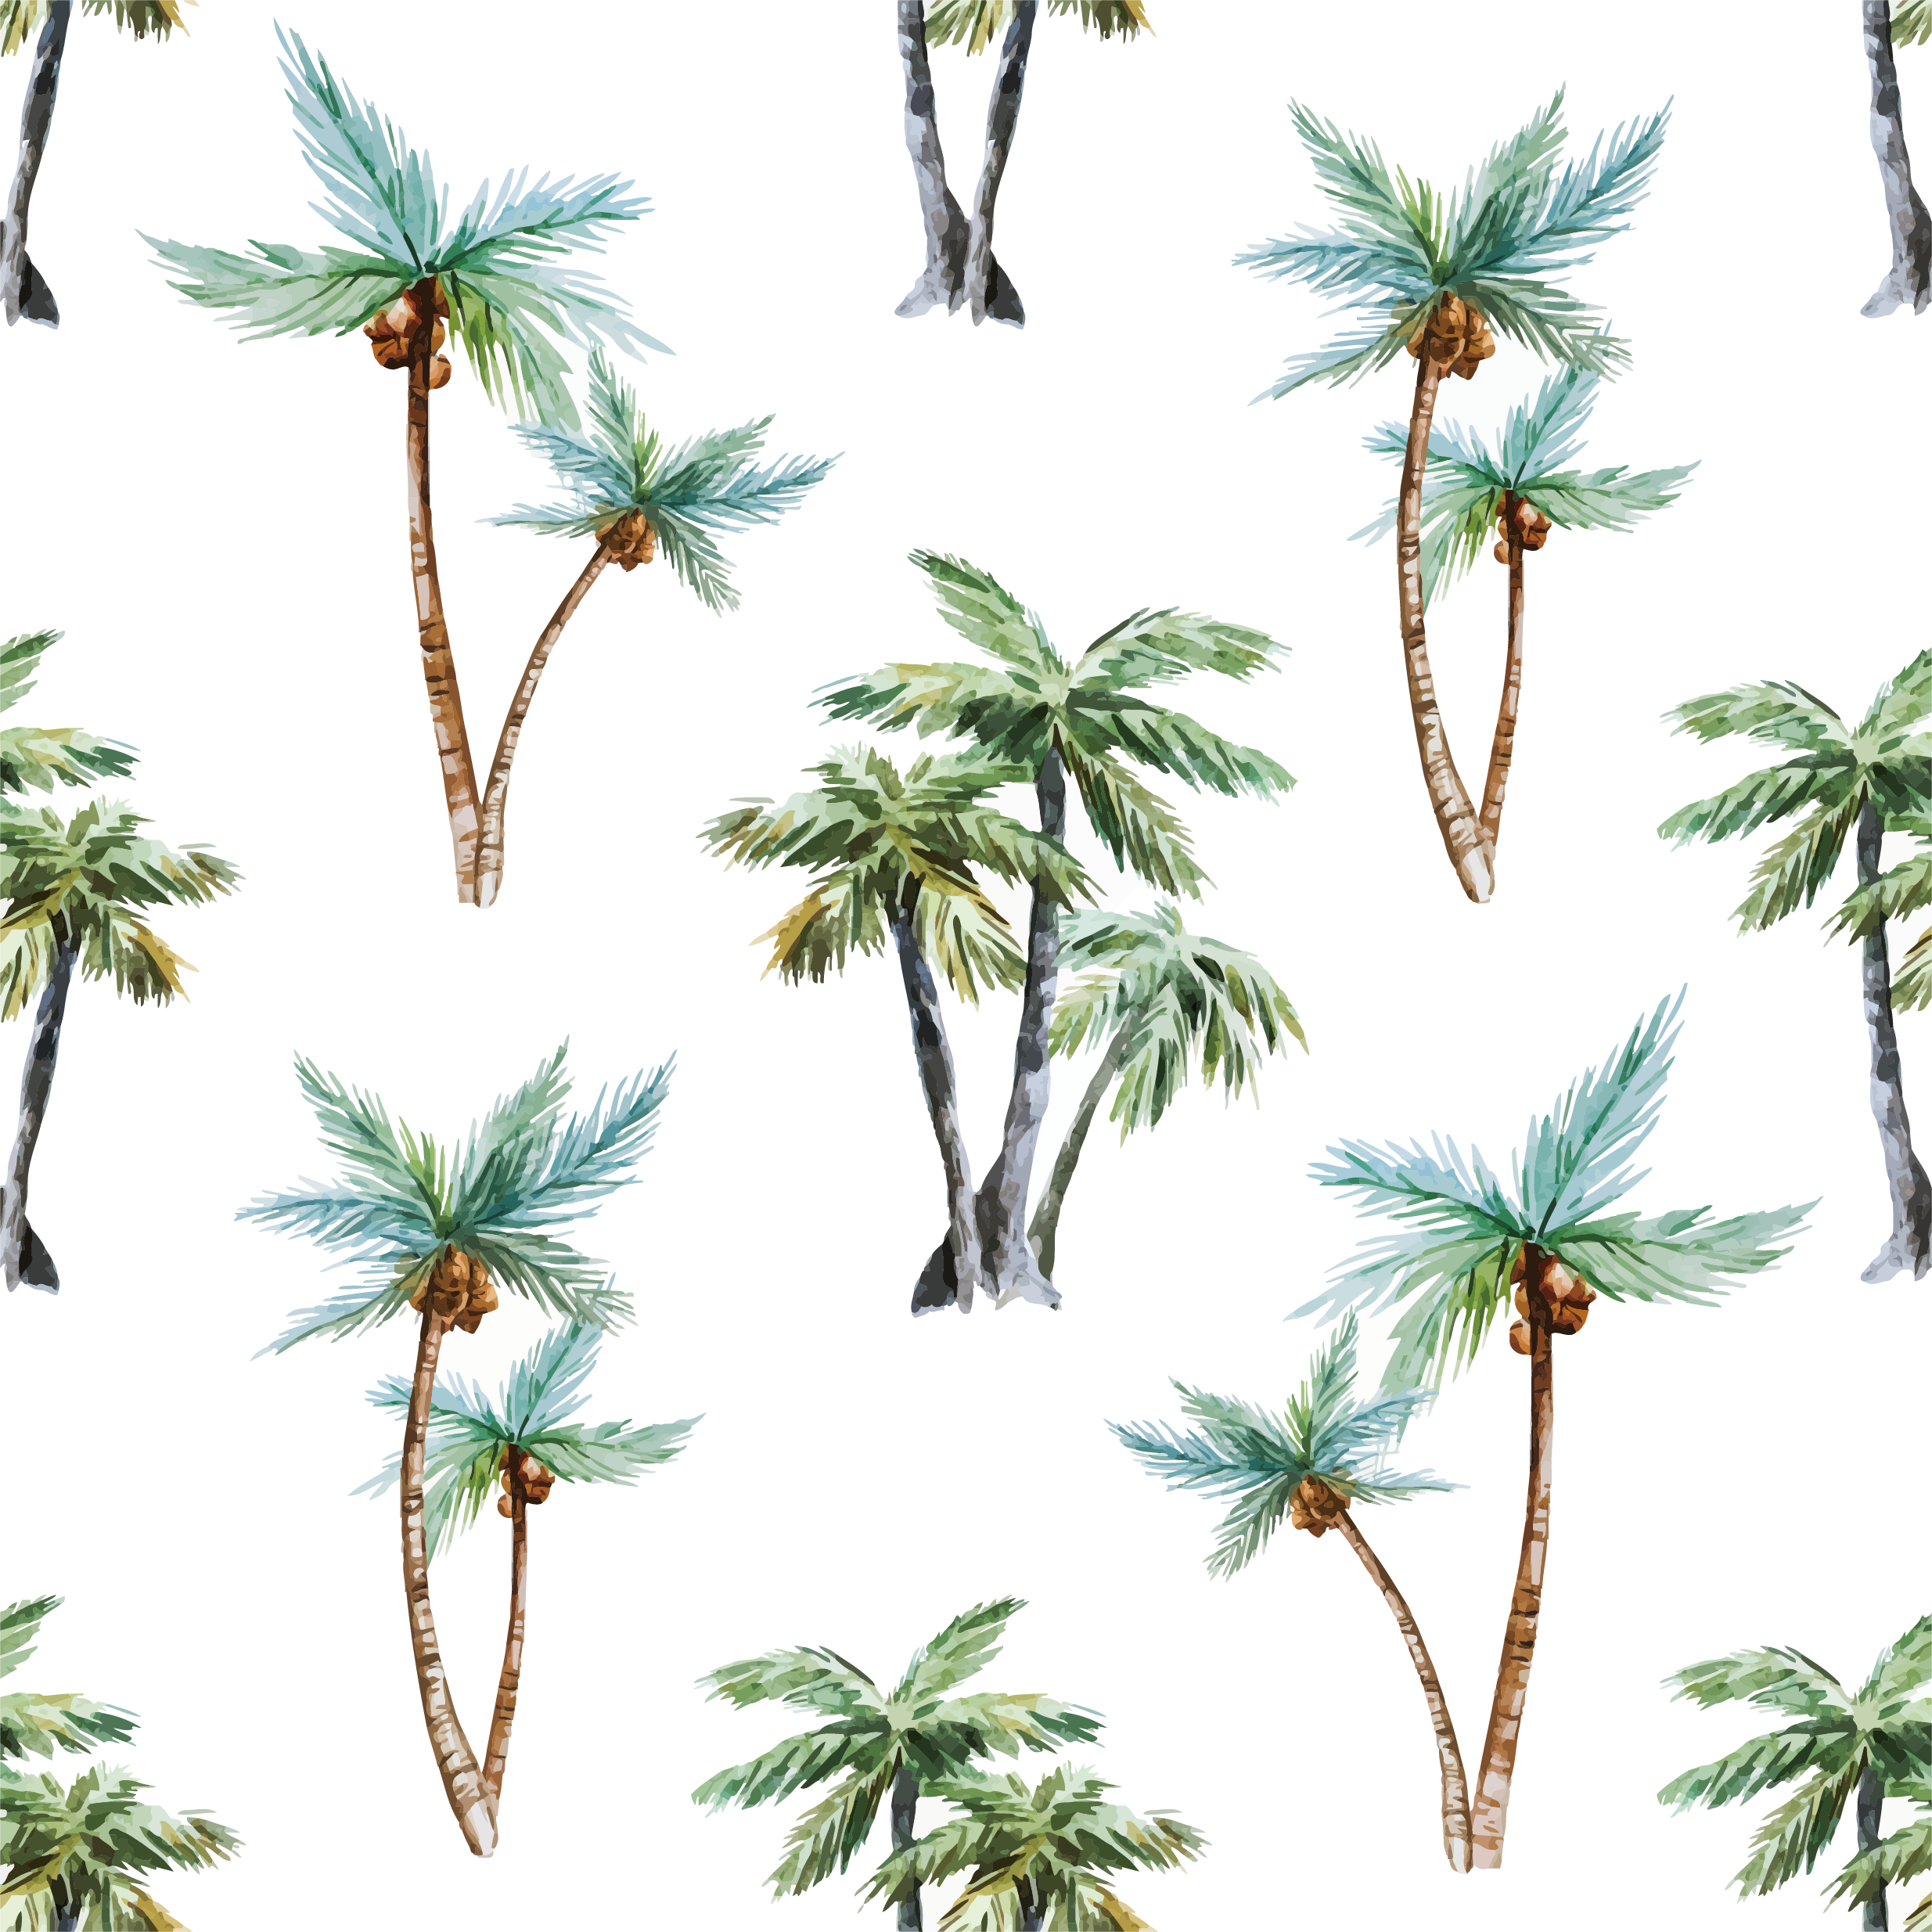 2469x2469 Arecaceae Watercolor Painting Tree Euclidean Vector